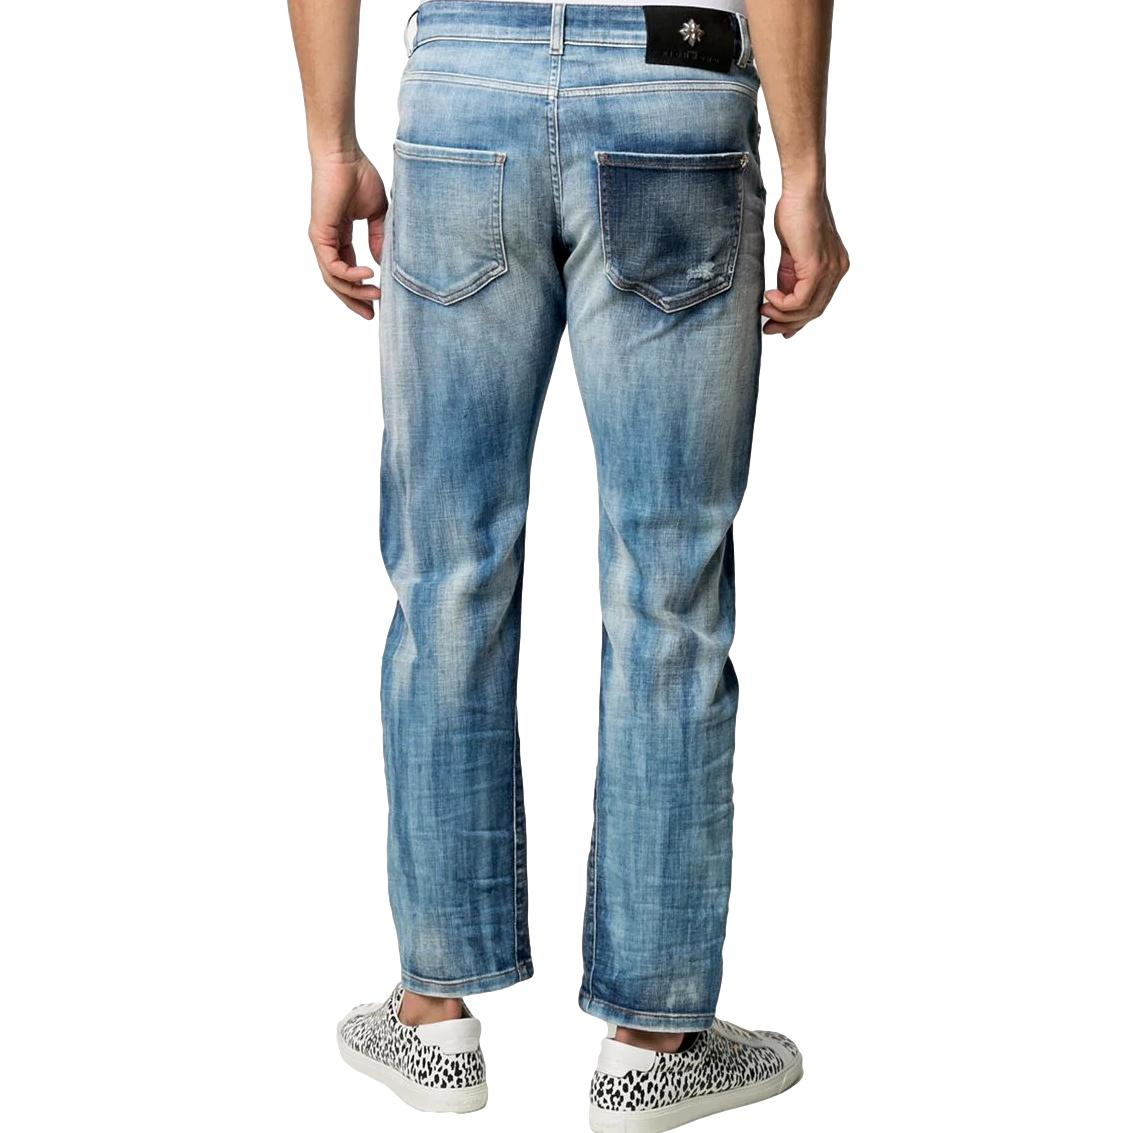 Jeans slim con effetto vissuto galat(mick) RICHMOND JOHN | Jeans | RMP21127JE9GD.BLUE